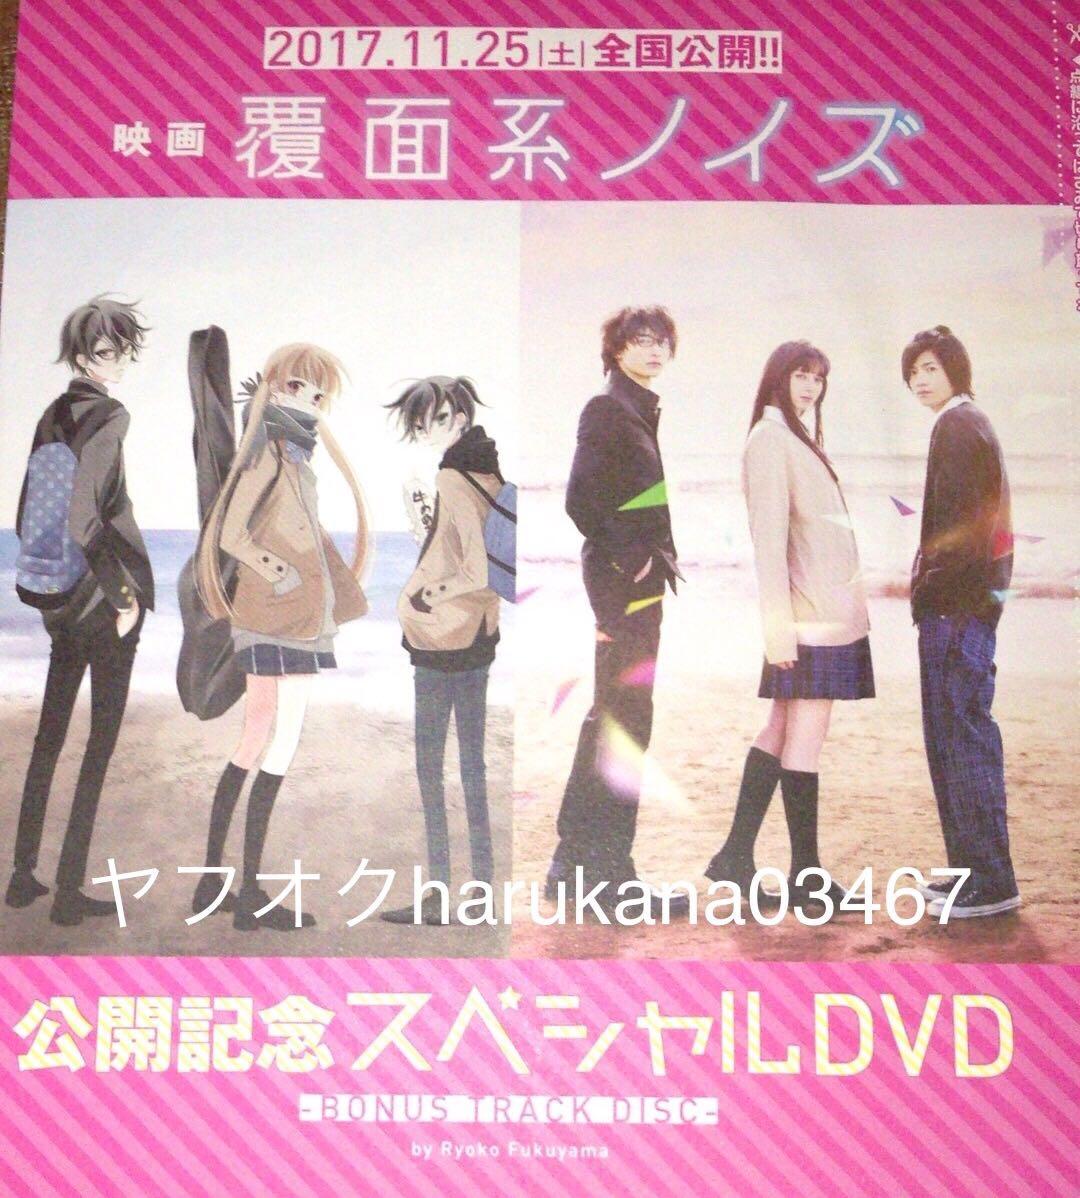 movie mask series noise public memory special DVD Fukuyama